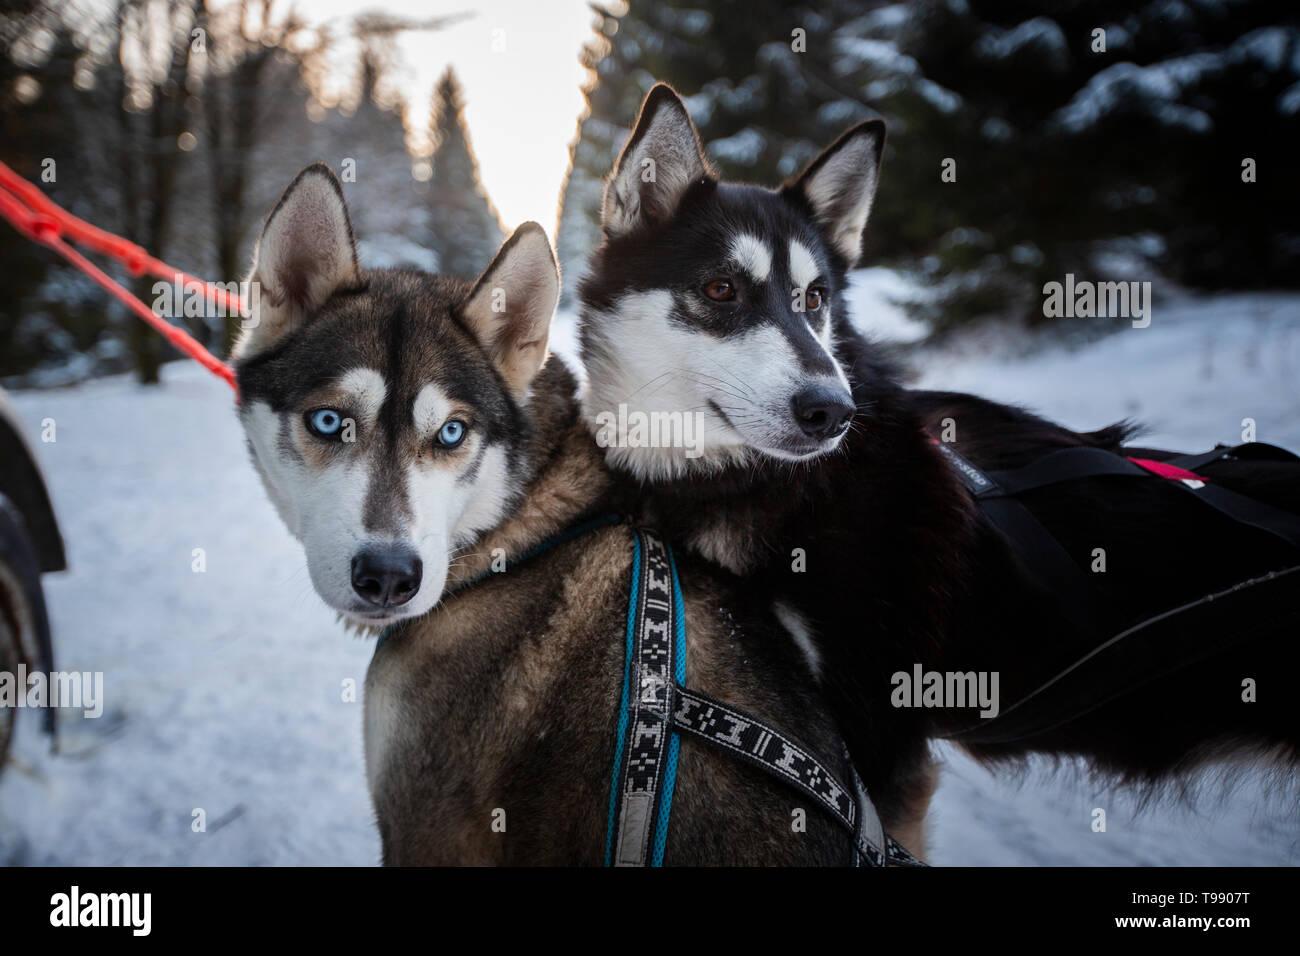 Husky sled dog tour, Thuringian Forest, Germany Stock Photo